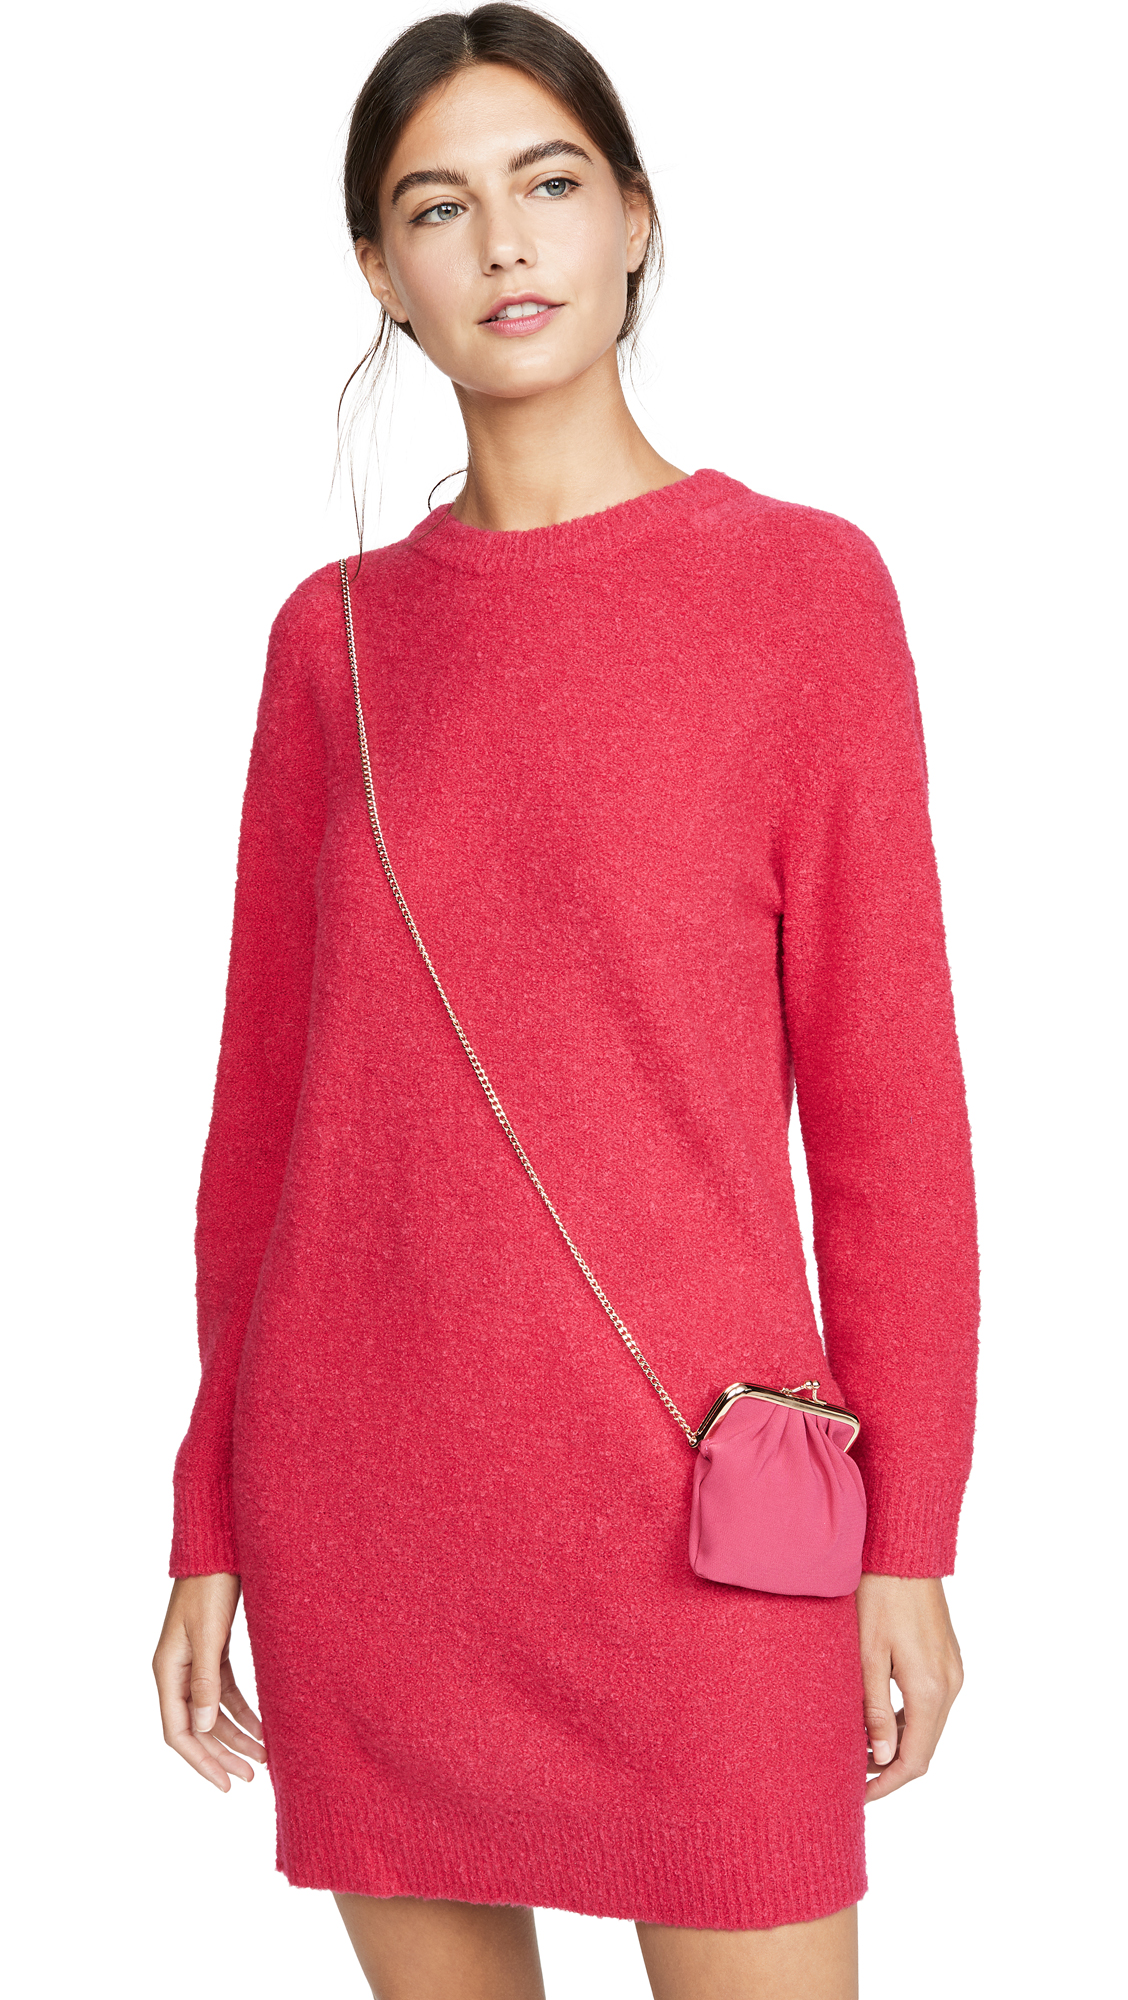 Boutique Moschino Long Sleeve Sweater Dress - Fuchsia